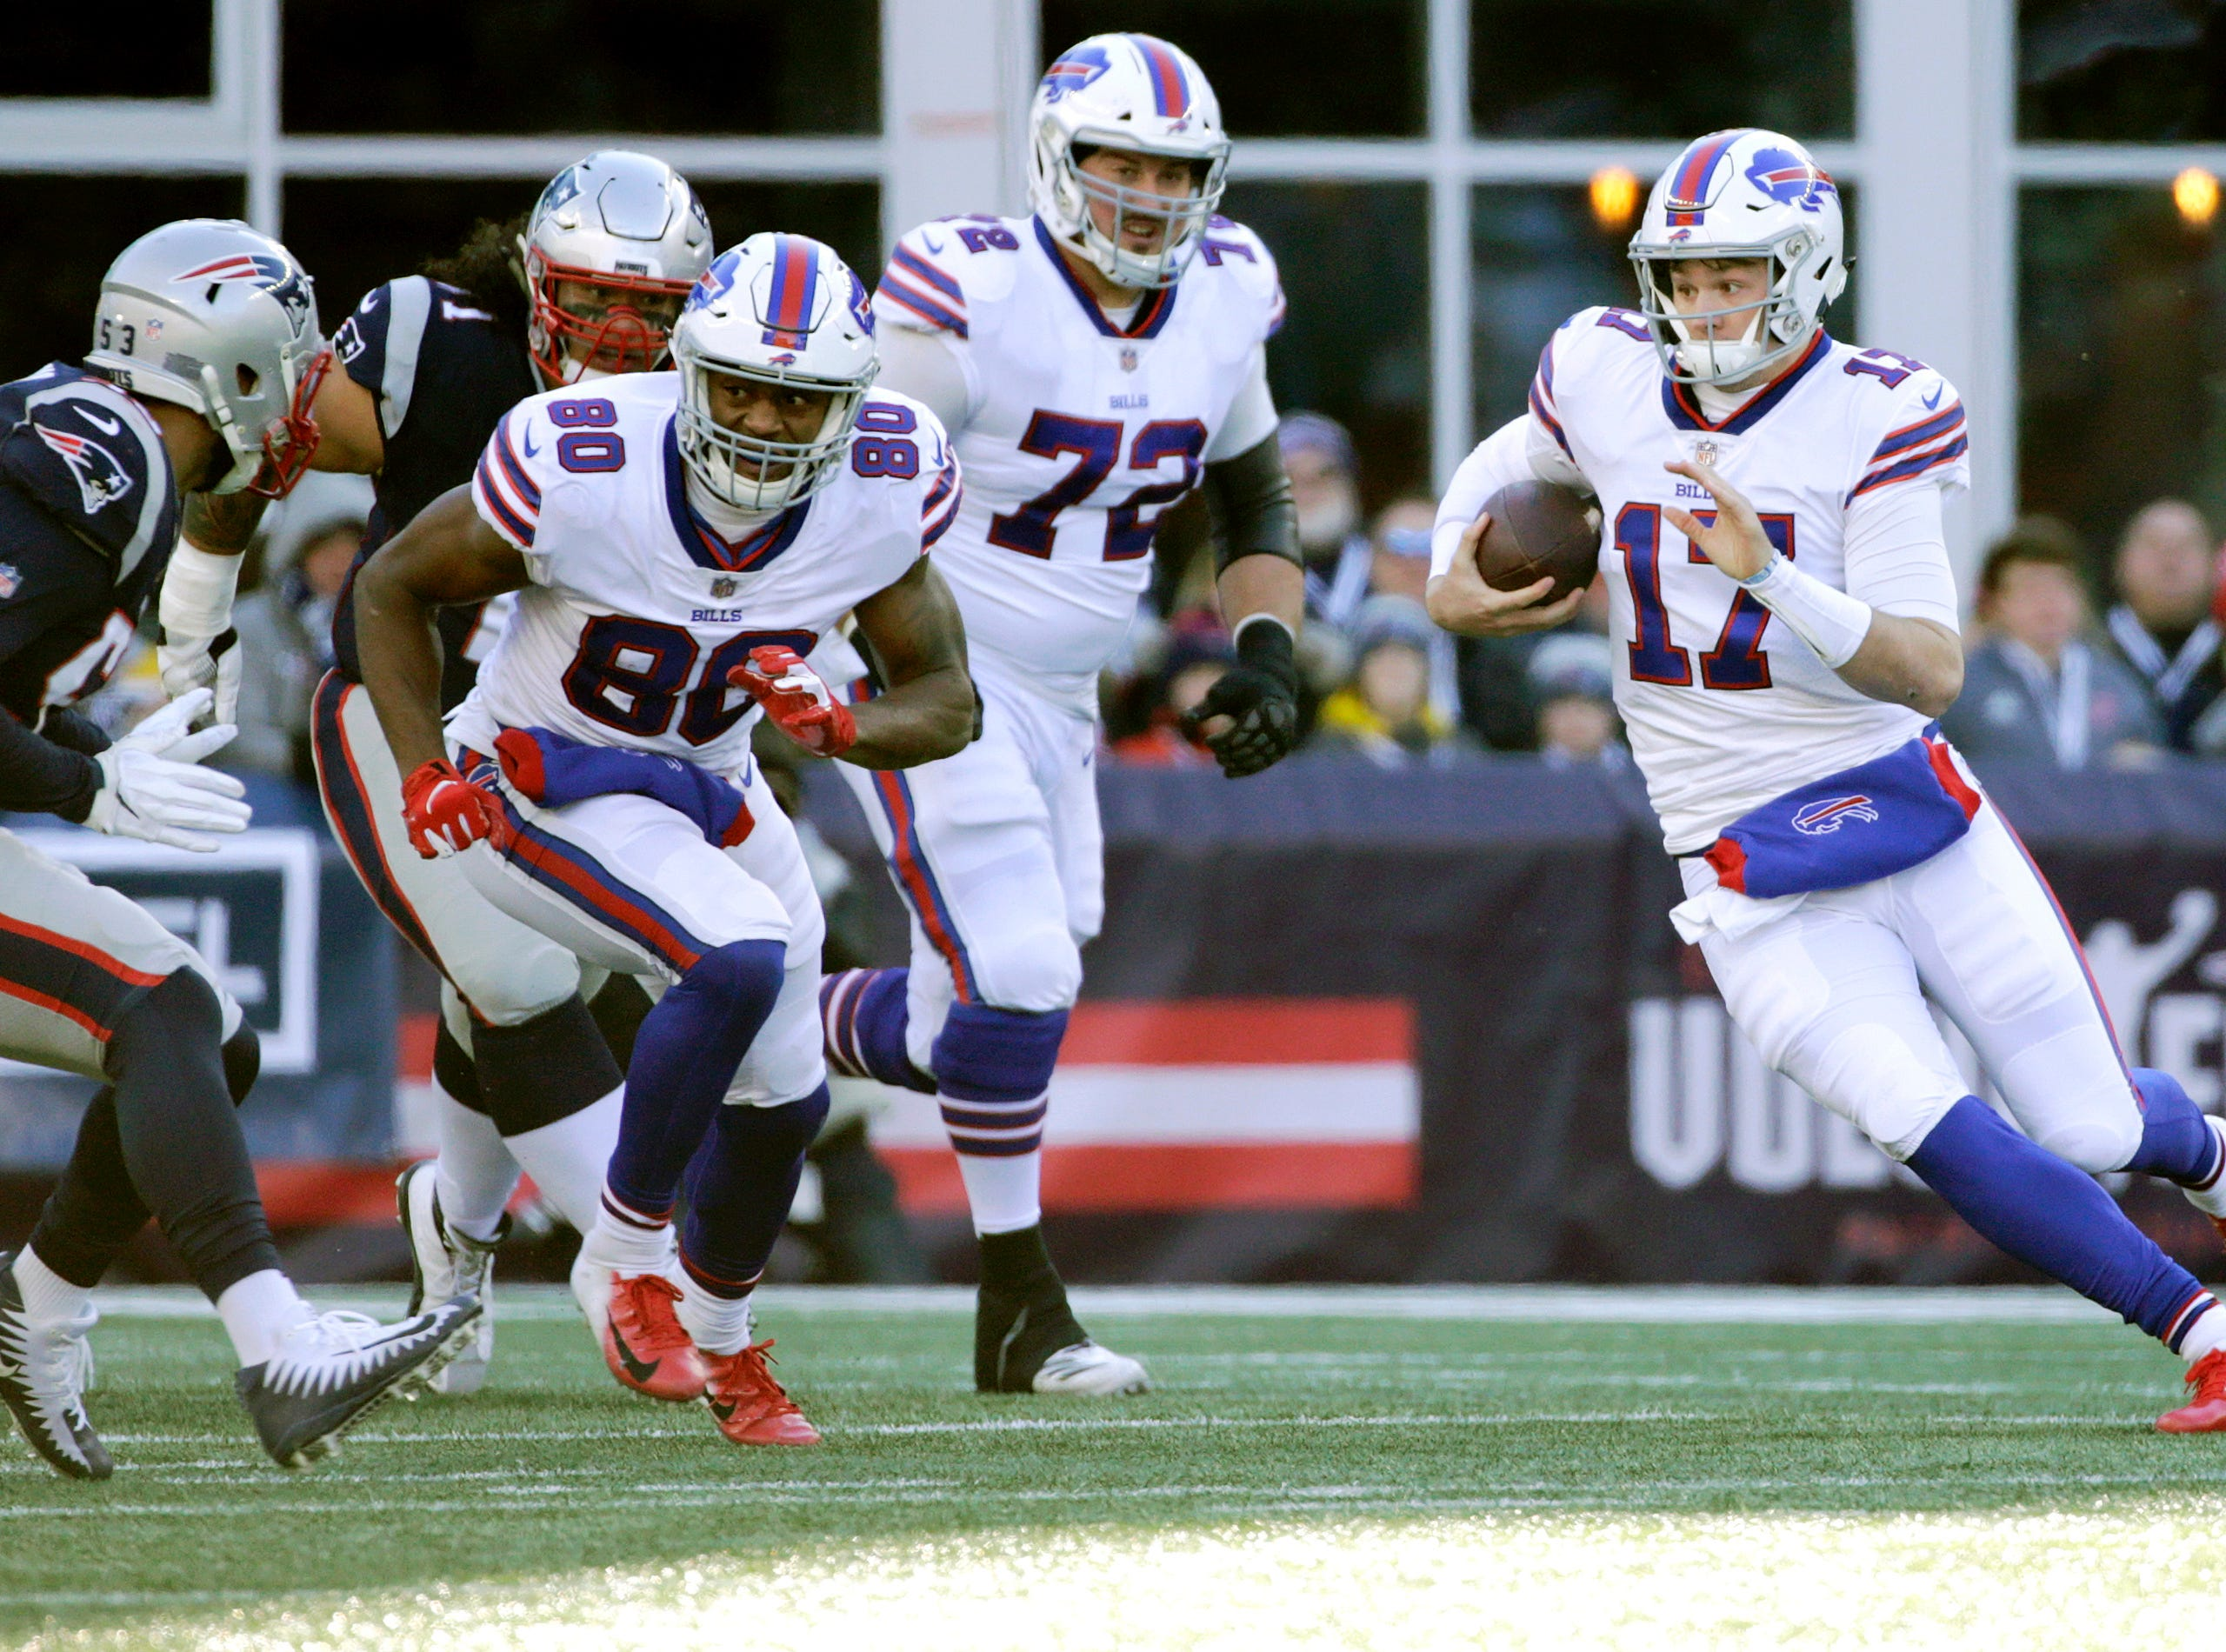 Buffalo Bills quarterback Josh Allen (17) runs against the New England Patriots during the first half of an NFL football game, Sunday, Dec. 23, 2018, in Foxborough, Mass. (AP Photo/Elise Amendola)